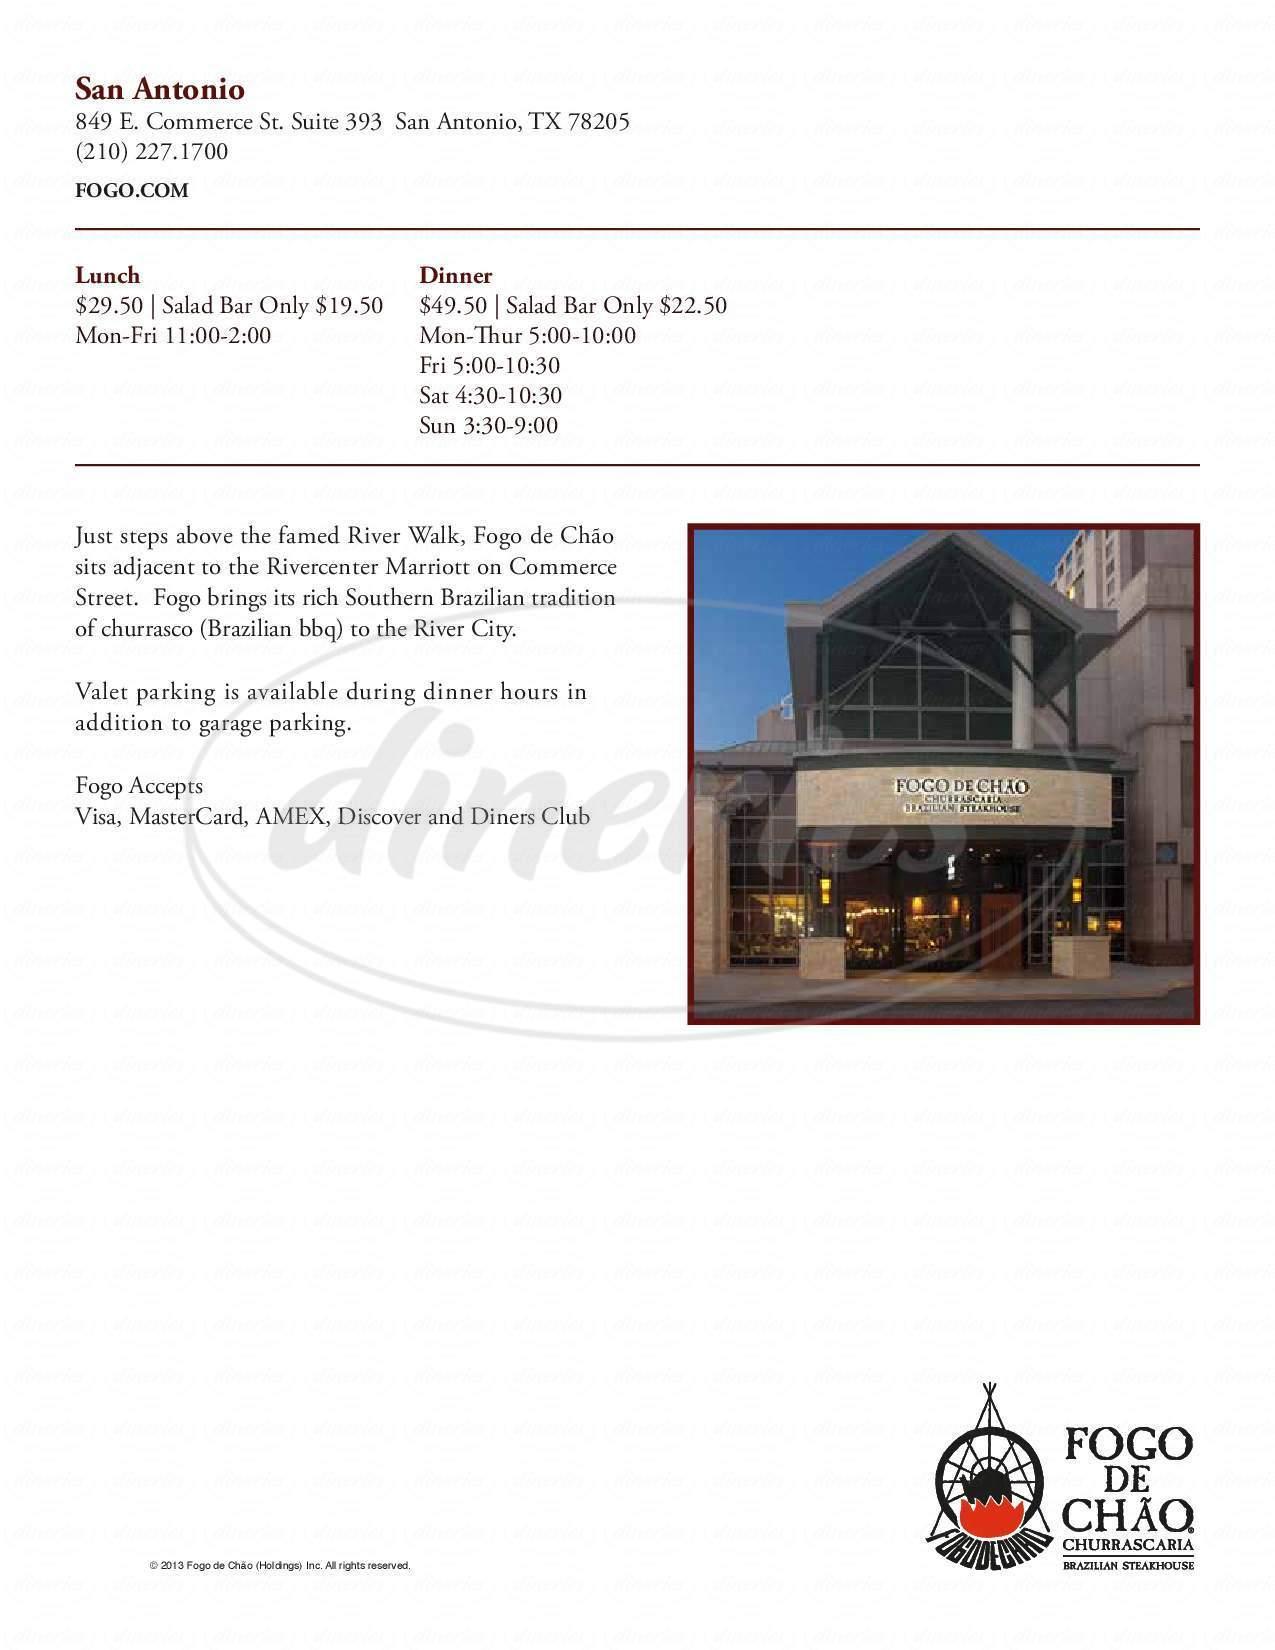 menu for Fogo de Chao San Antonio